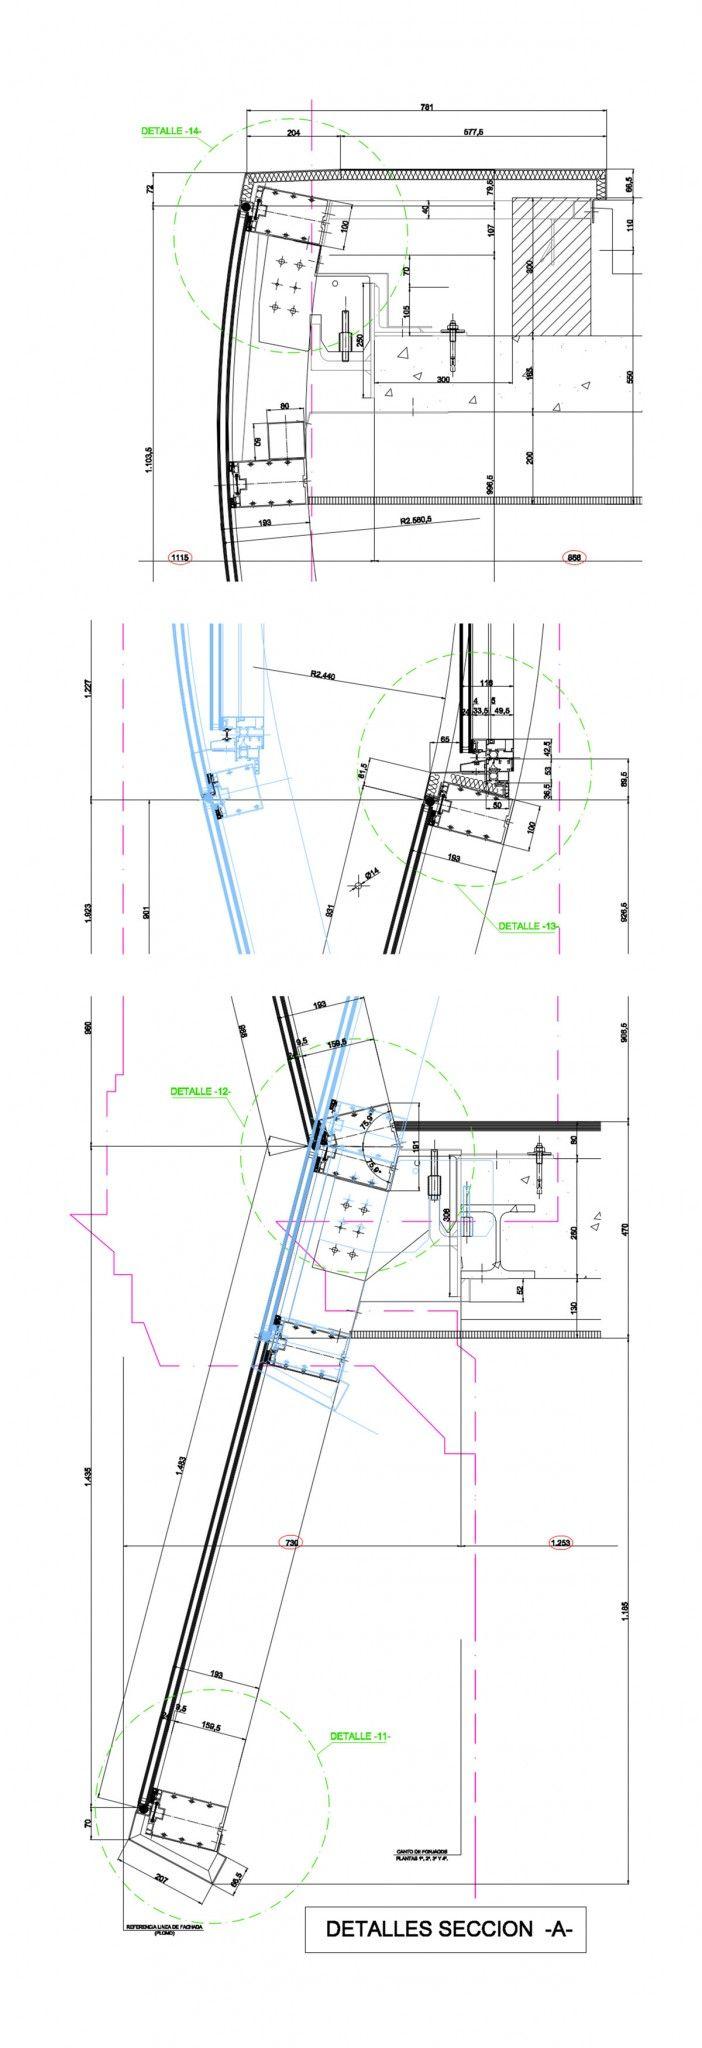 Detalle constructivo de fachada modular para la construcción de 12 viviendas en la calle Hurtado Amezaga